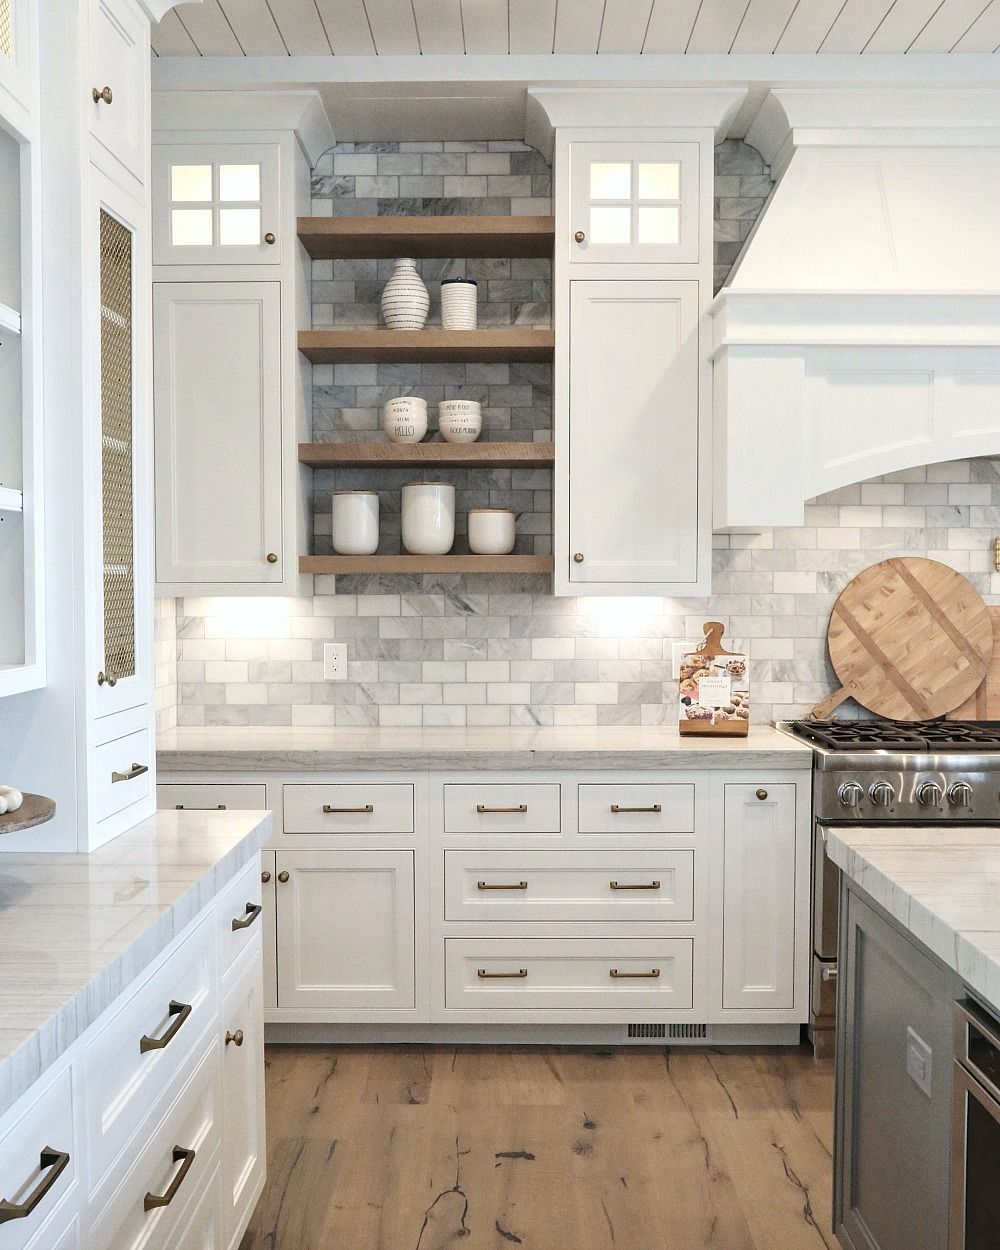 Floating Shelves Over Kitchen Island Kitchen Cabinets Decor Rustic Farmhouse Kitchen Farmhouse Kitchen Backsplash